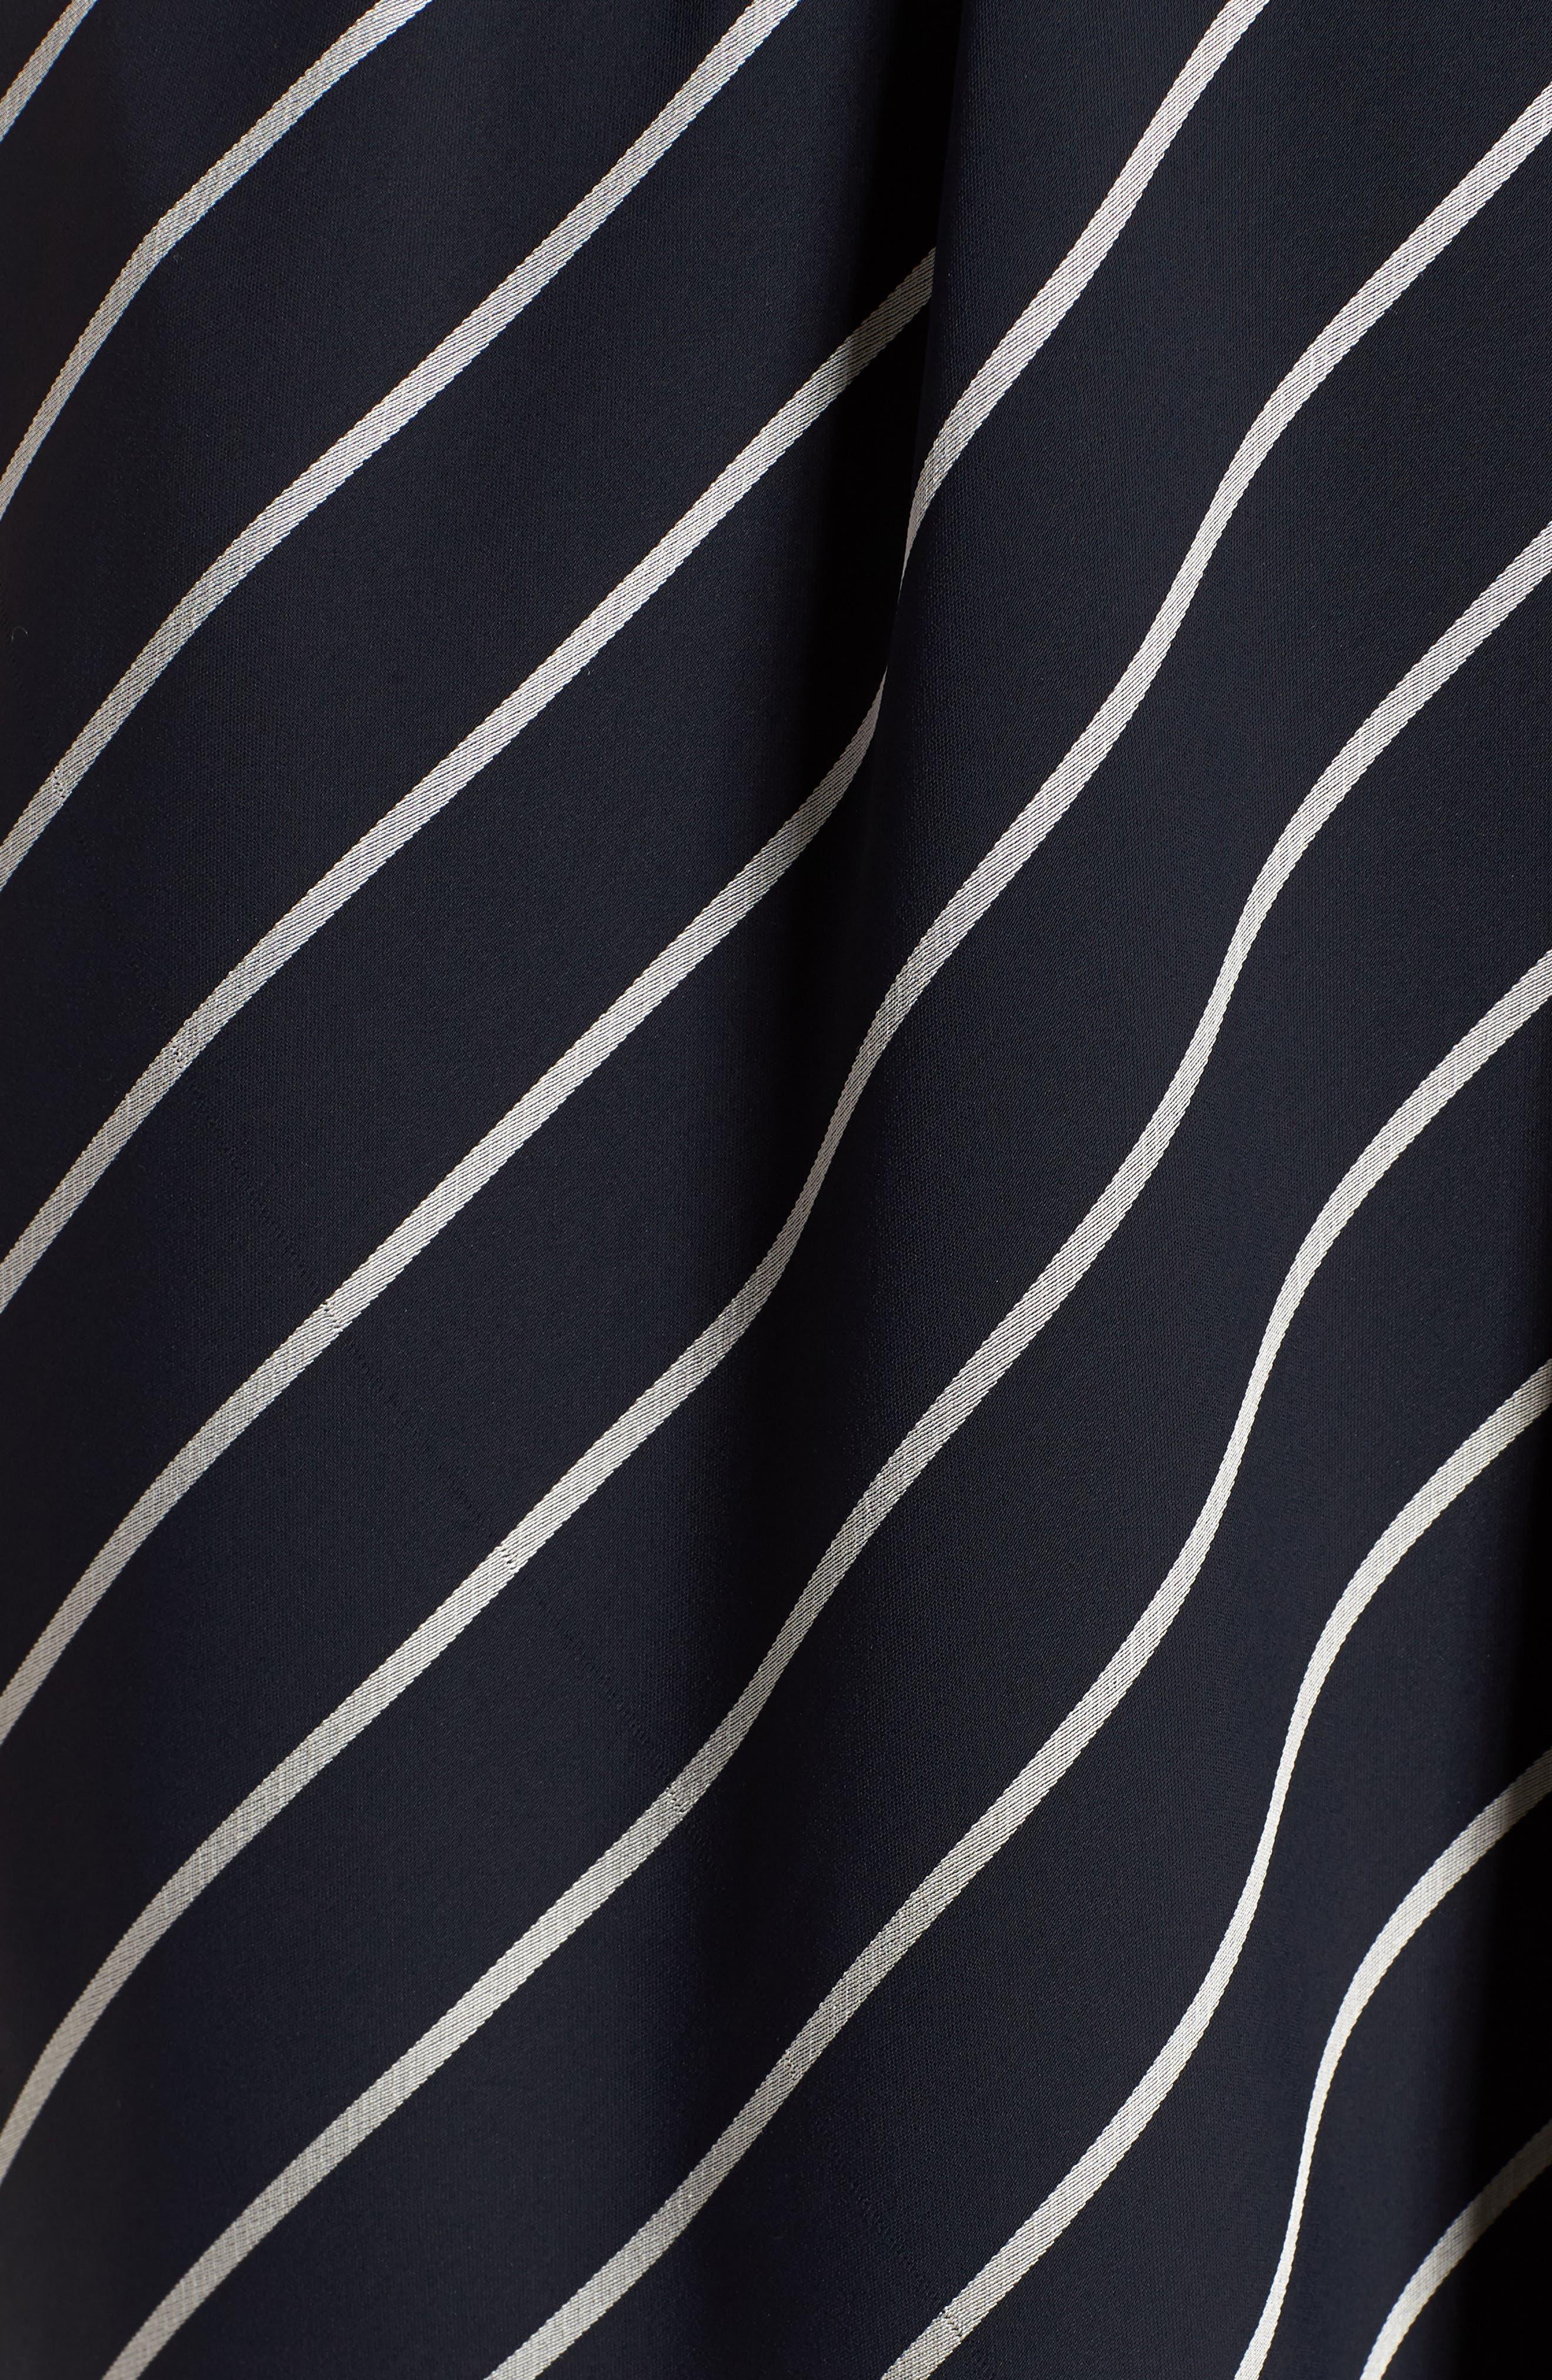 Pinstripe Ruffle Wrap Dress,                             Alternate thumbnail 6, color,                             Navy/ White